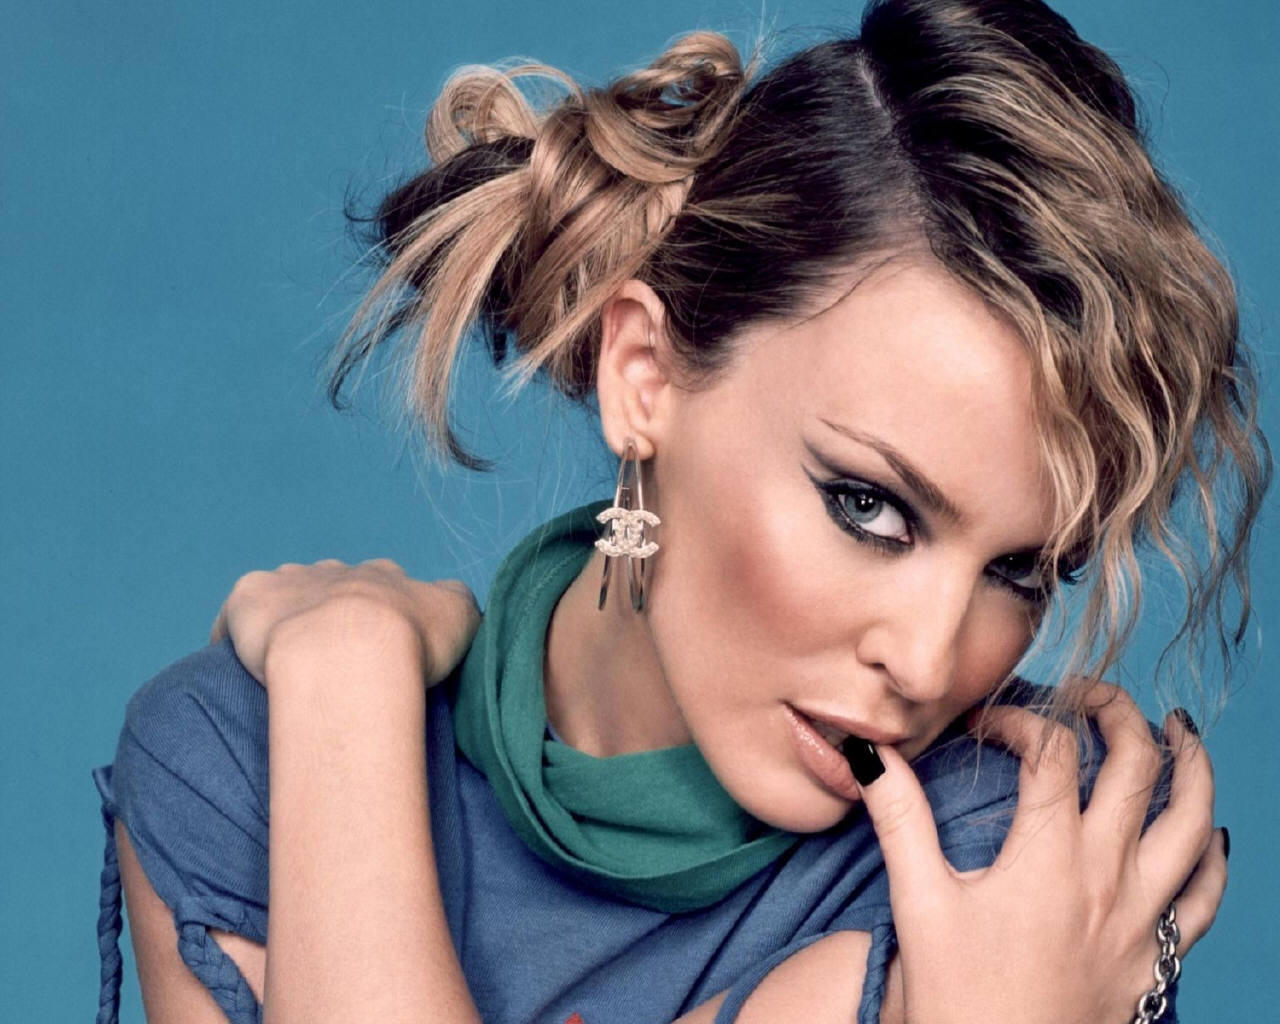 http://3.bp.blogspot.com/--USrfO_lf7g/UJNXc5fAnbI/AAAAAAAABJU/U3dTk7Zx-lA/s1600/Kylie-Minogue-kylie-minogue-64557_1280_1024.jpg